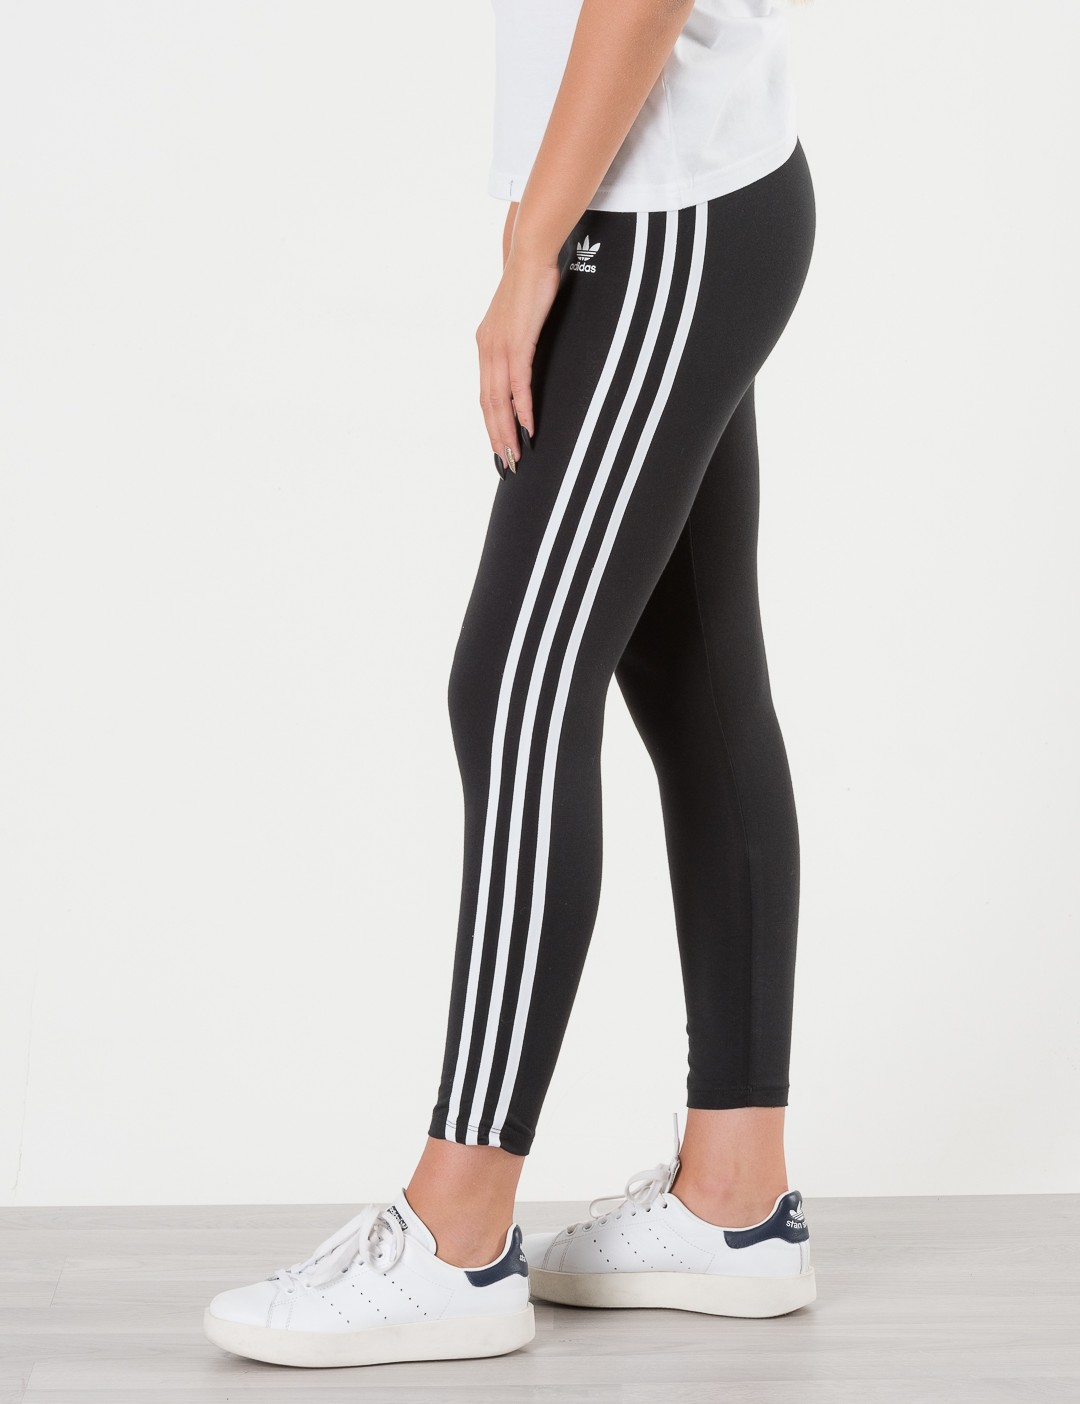 Das Neueste adidas Originals 3 Stripes Leggings Schwarz